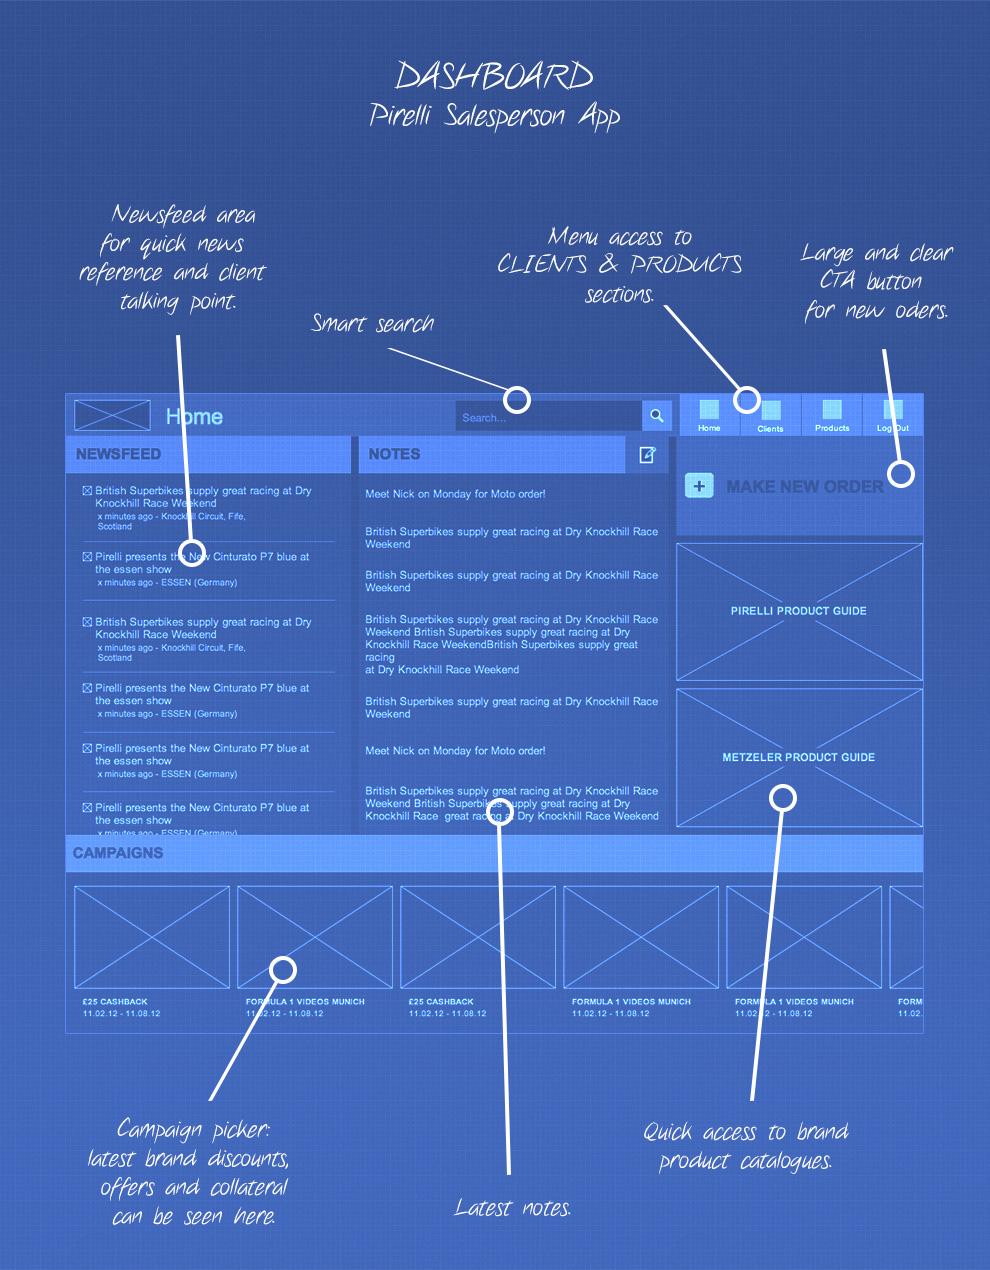 Pirelli_iPad_01_15